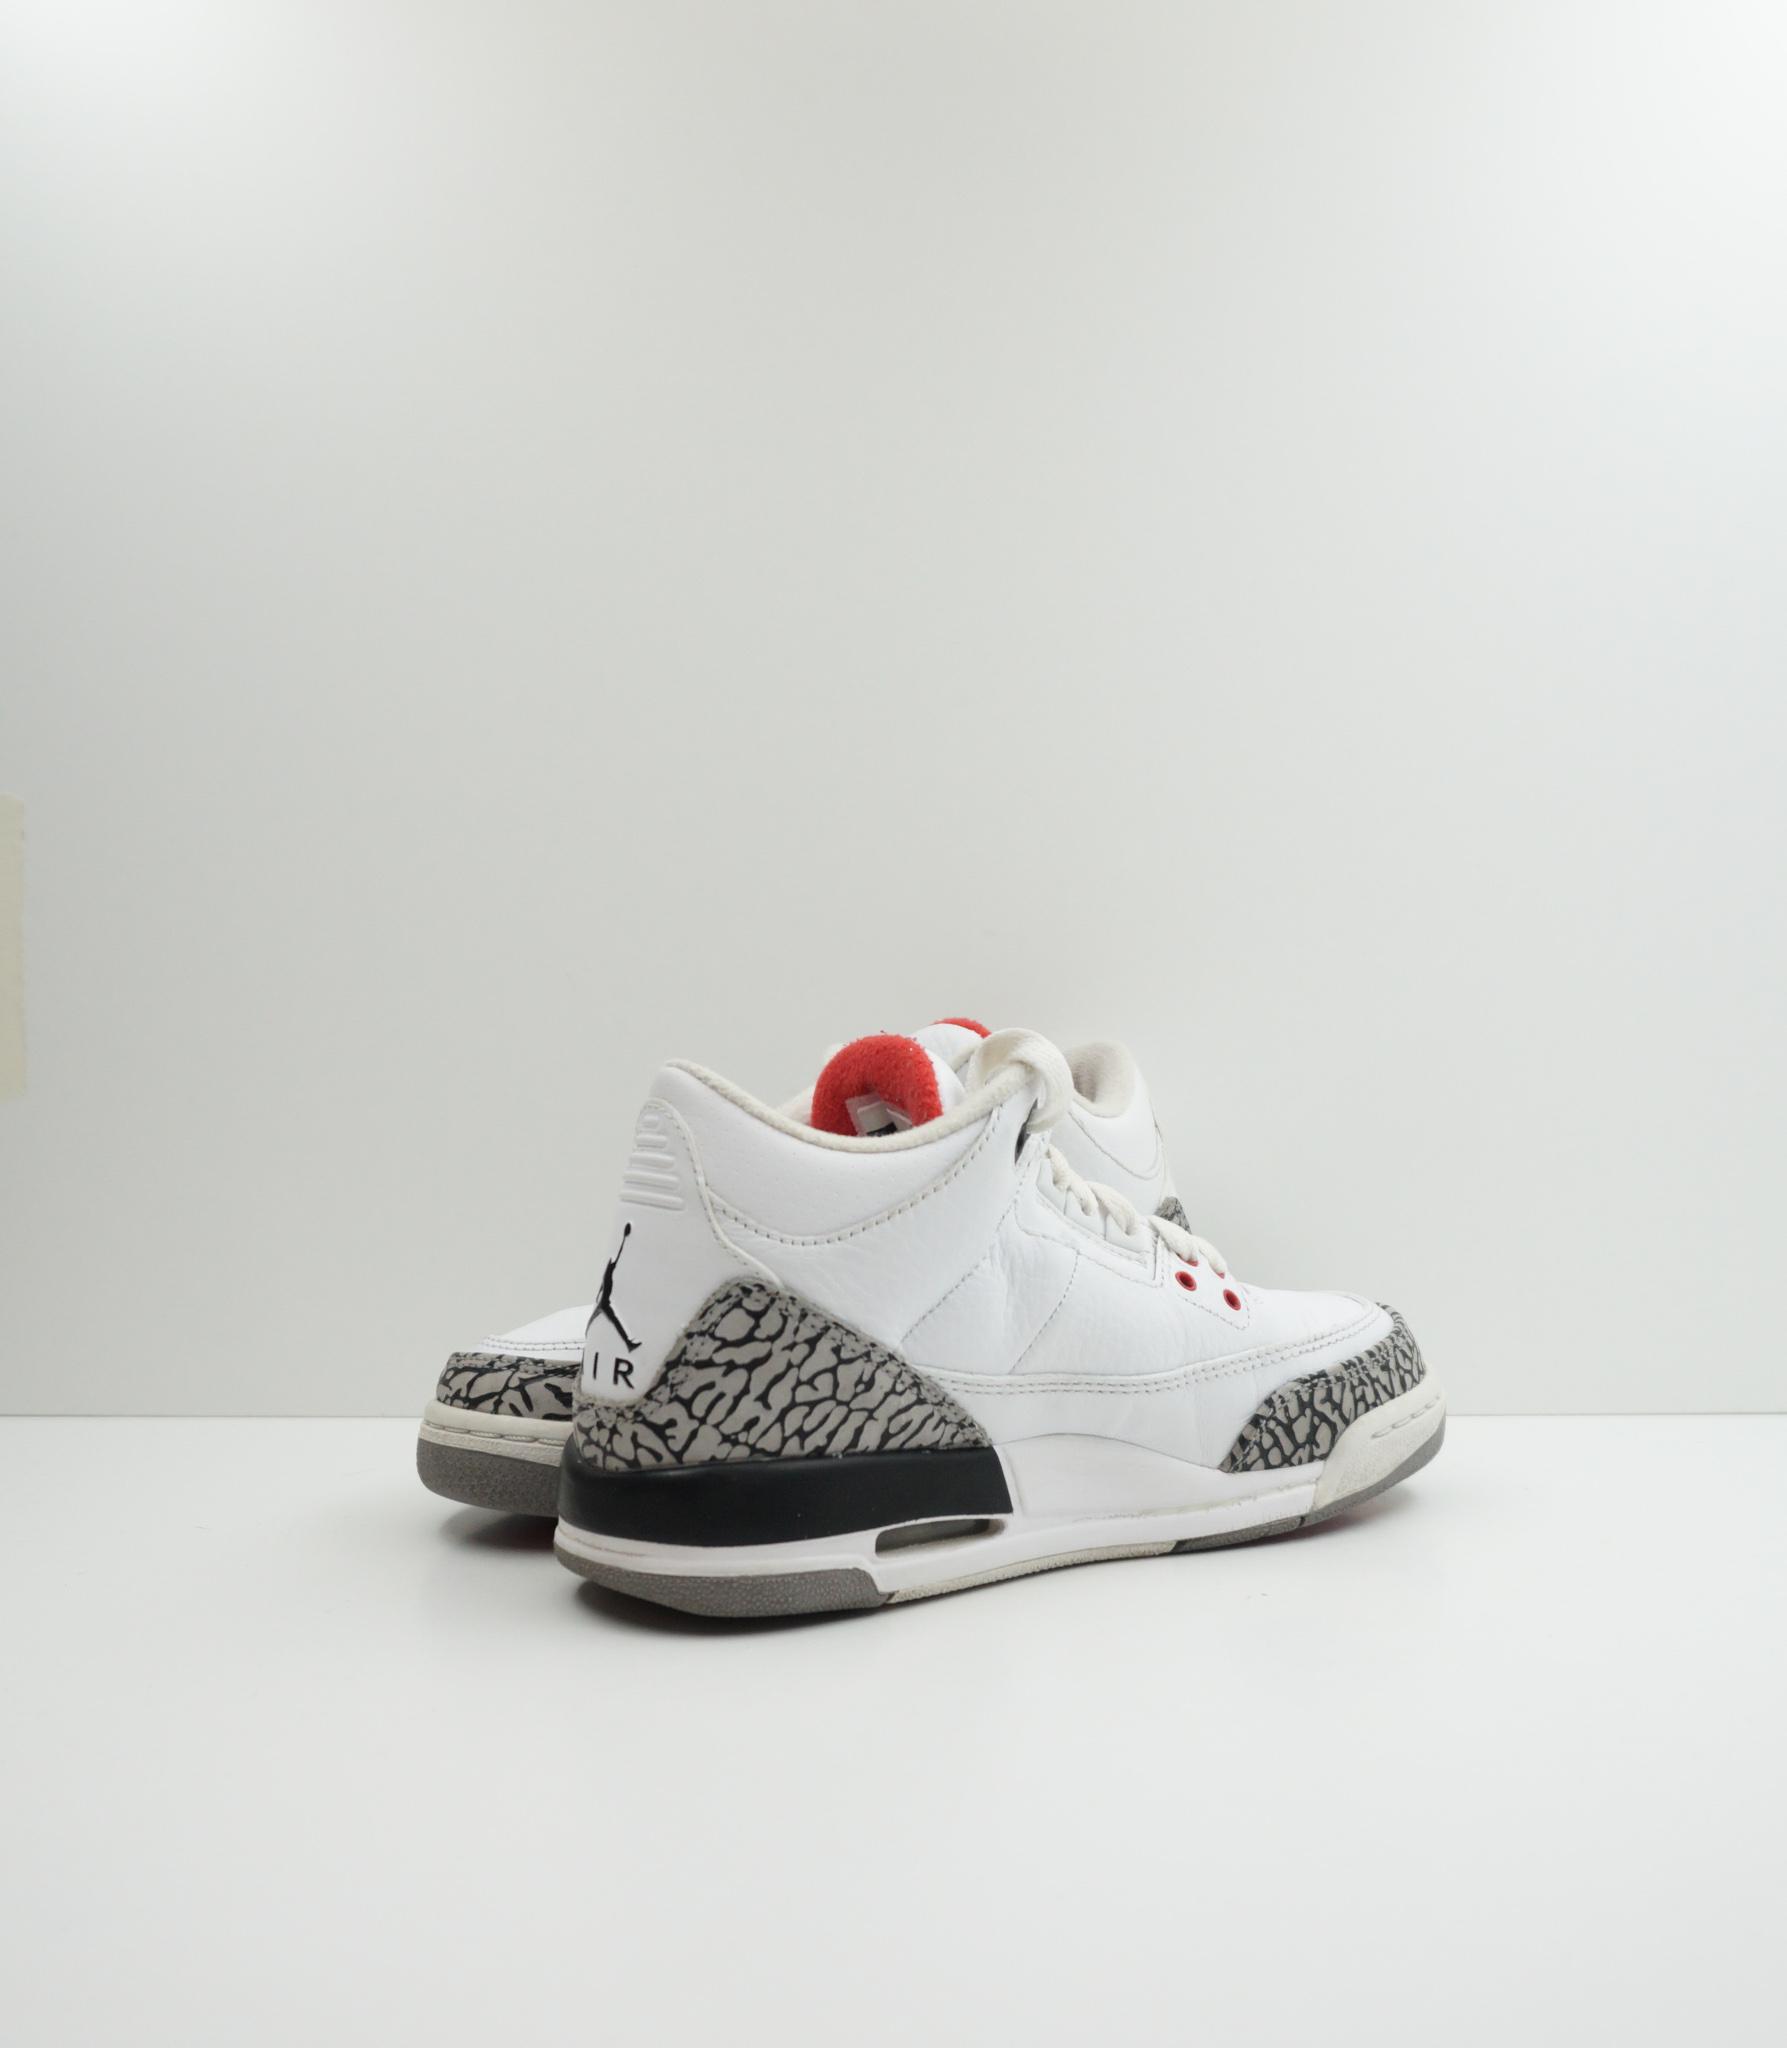 Jordan 3 Retro GS White Cement (2011)